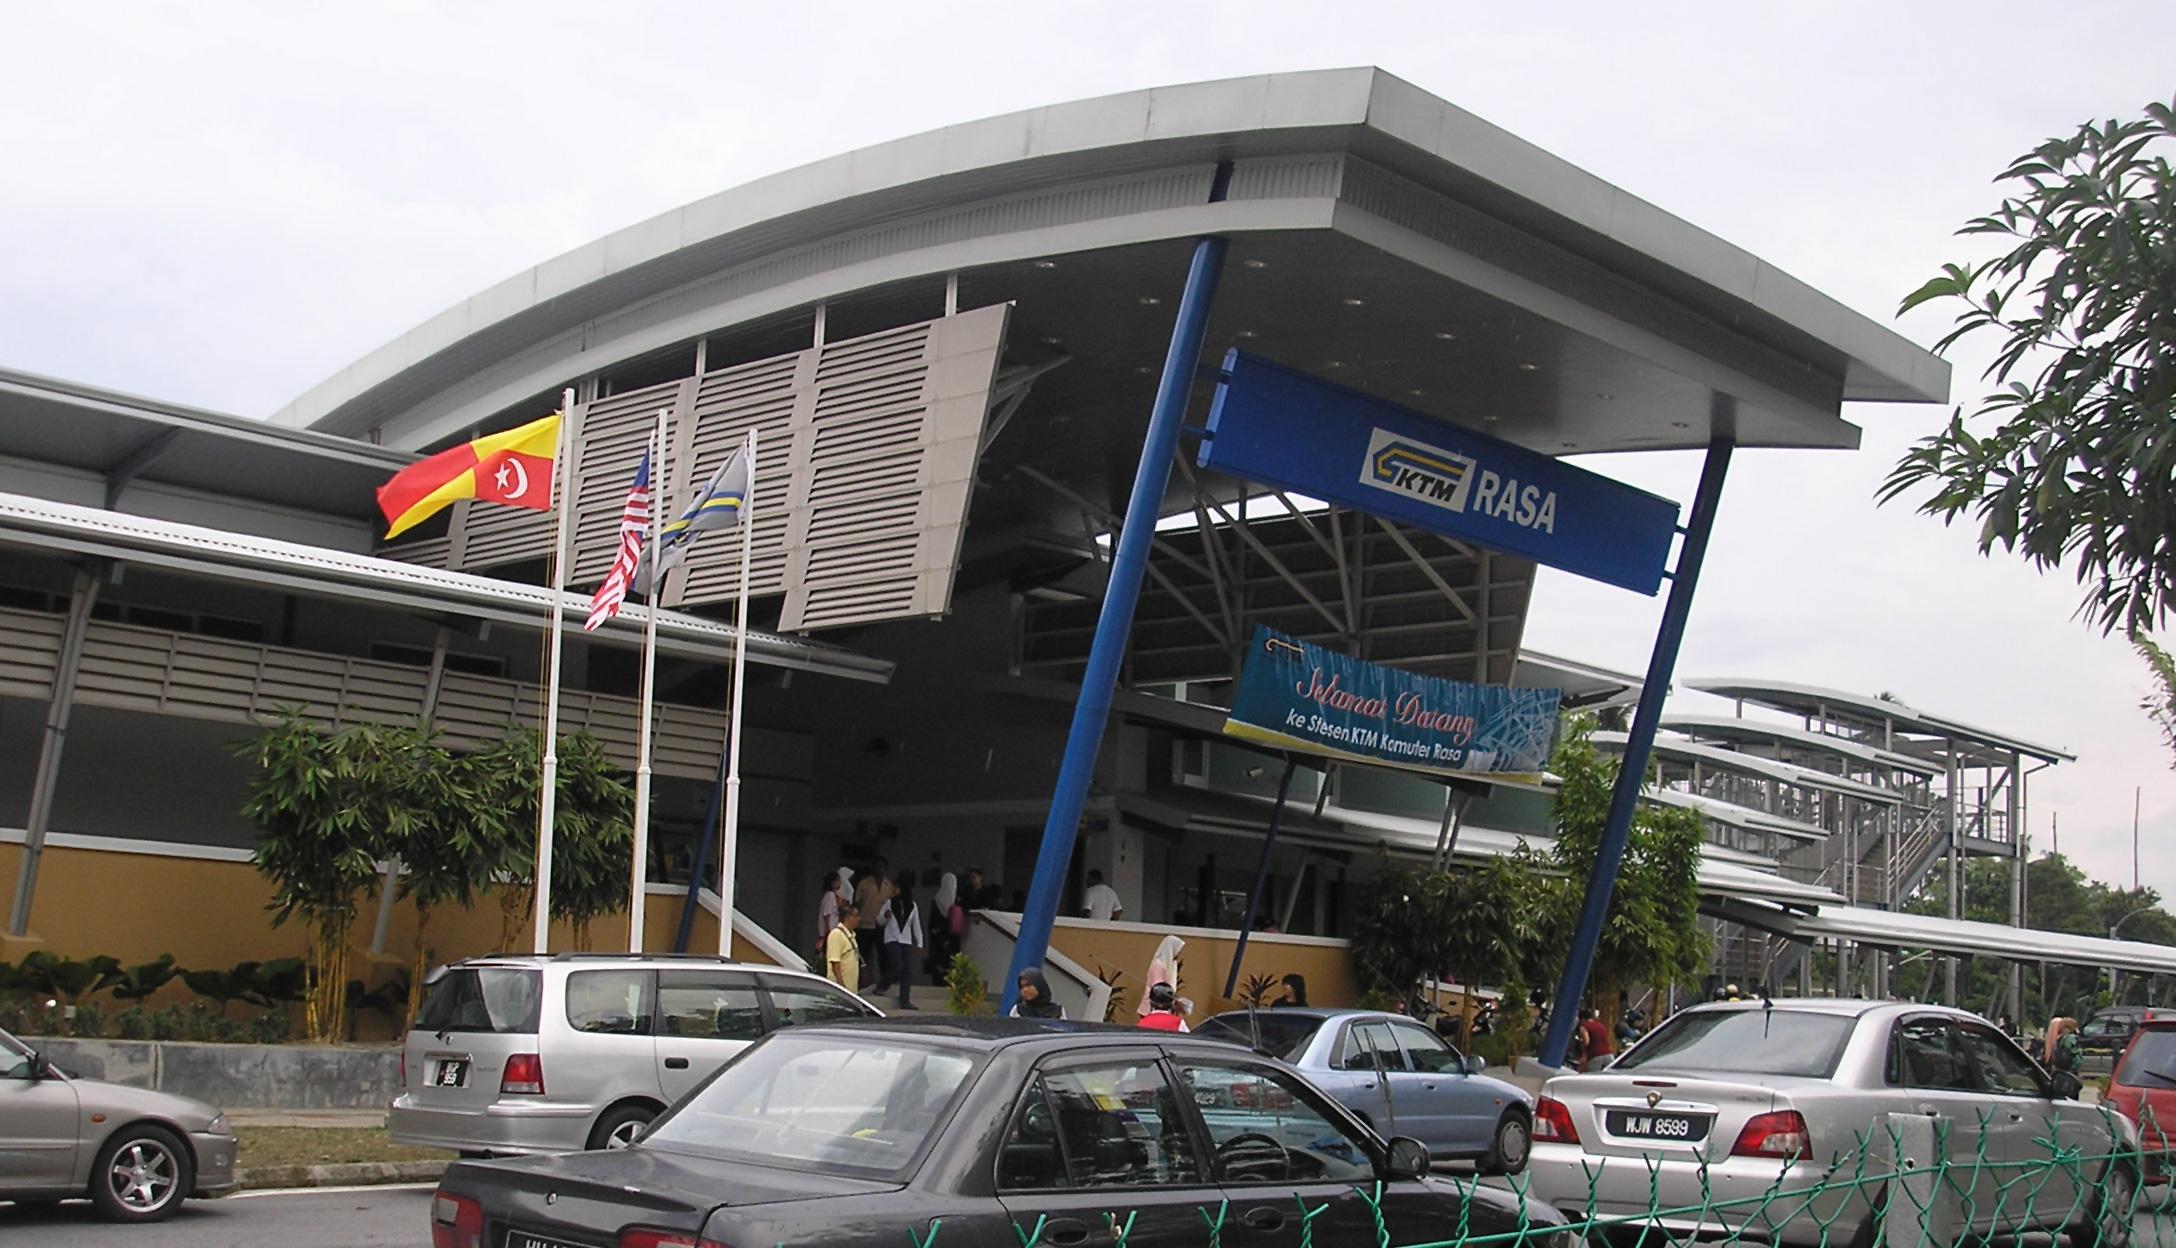 Butterworth Ktm Station Parking